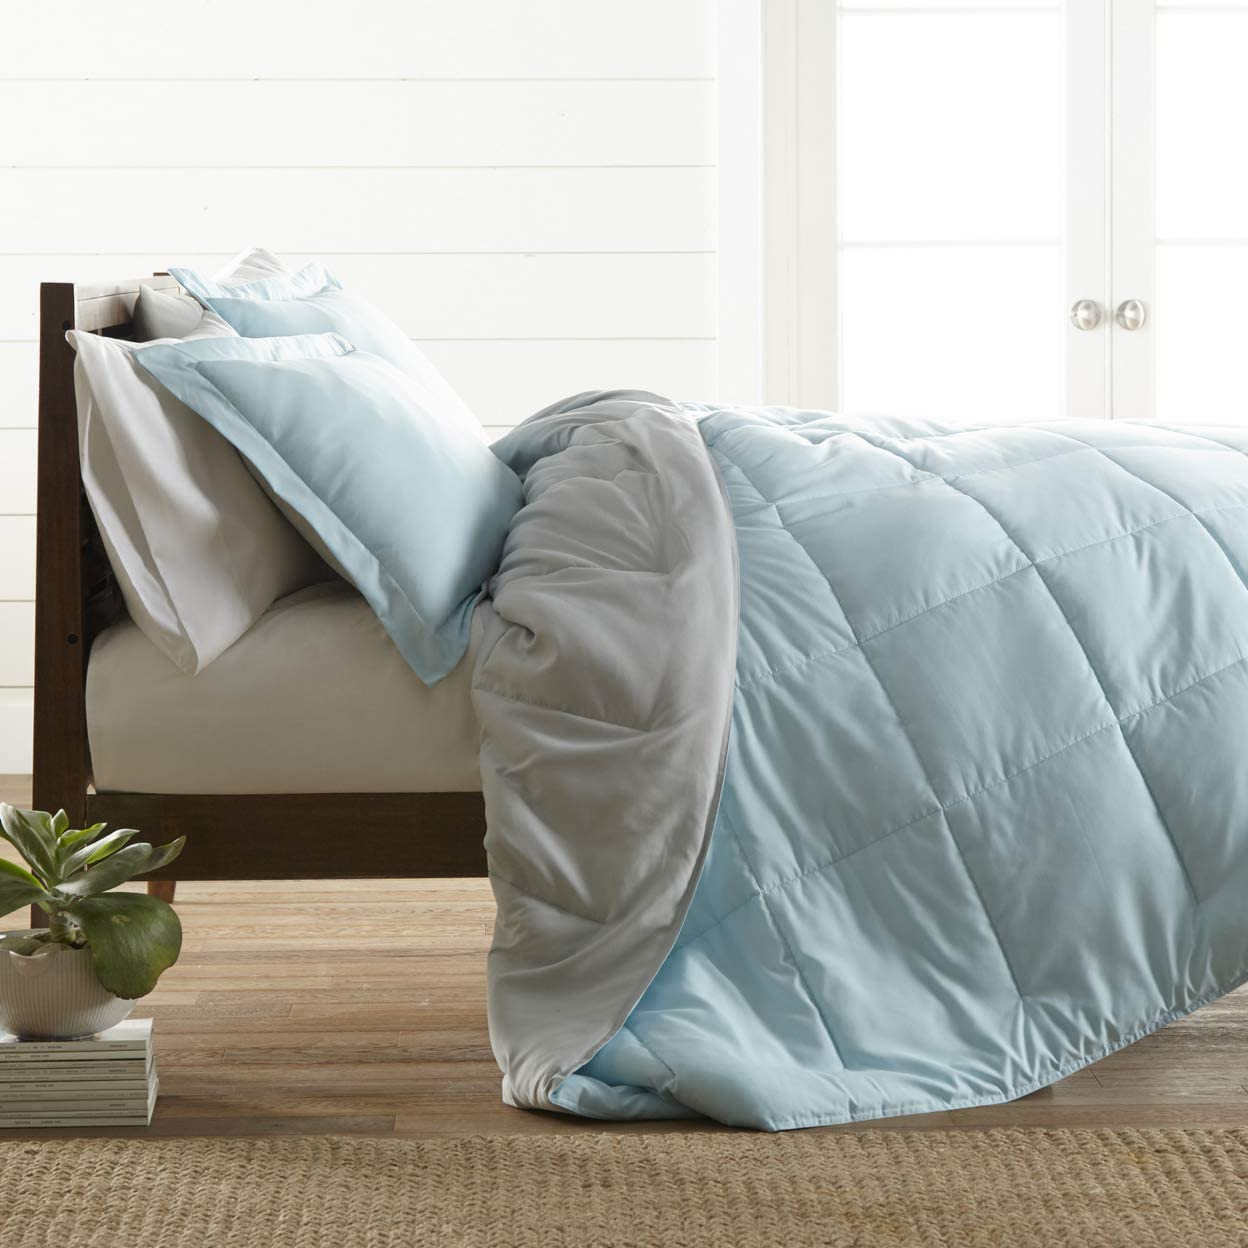 ienjoy Home Premium Down Alternative Reversible Comforter Set, Full/Queen, Aqua